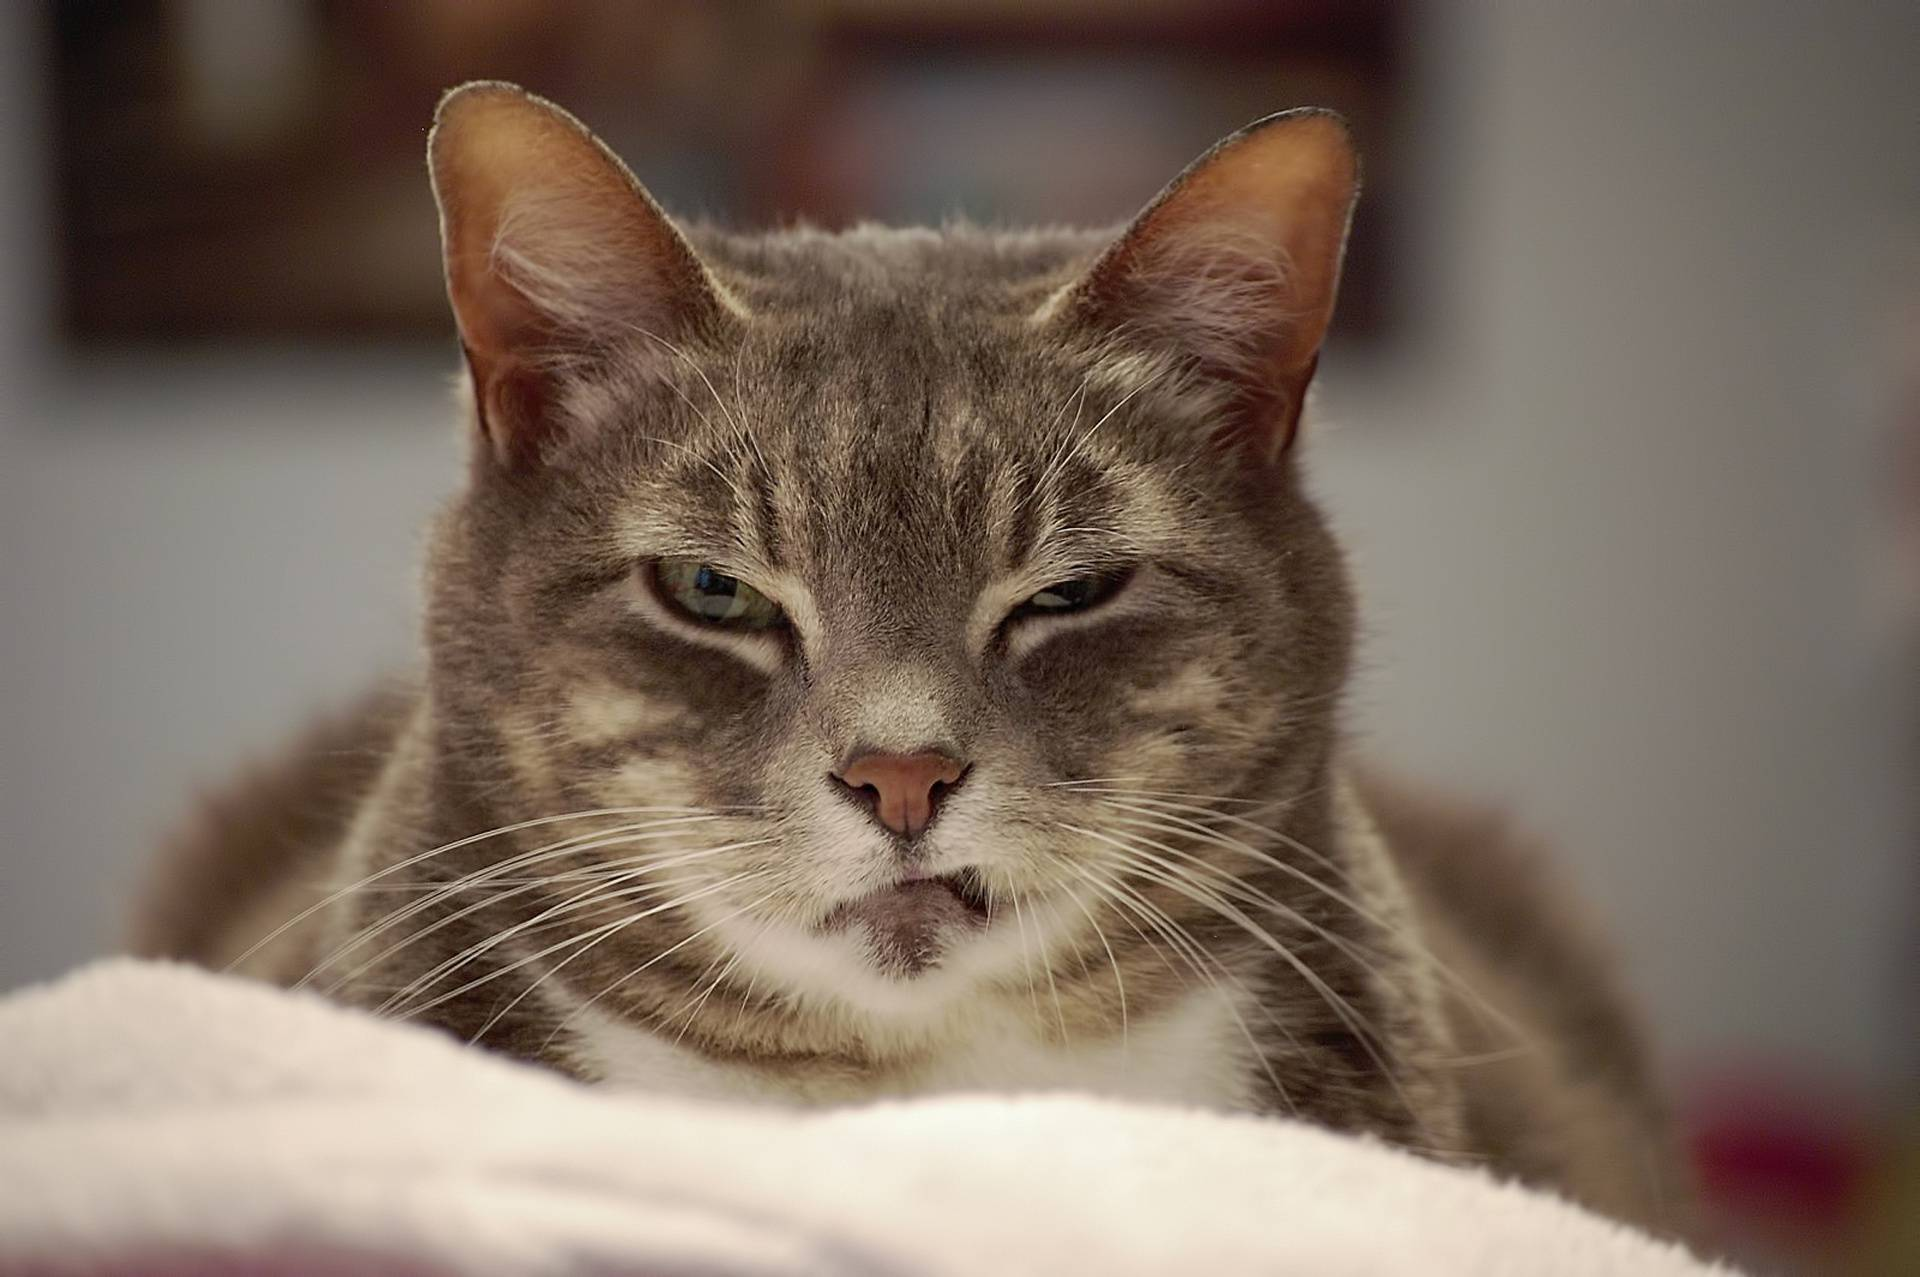 Кот болеет глаза щурит